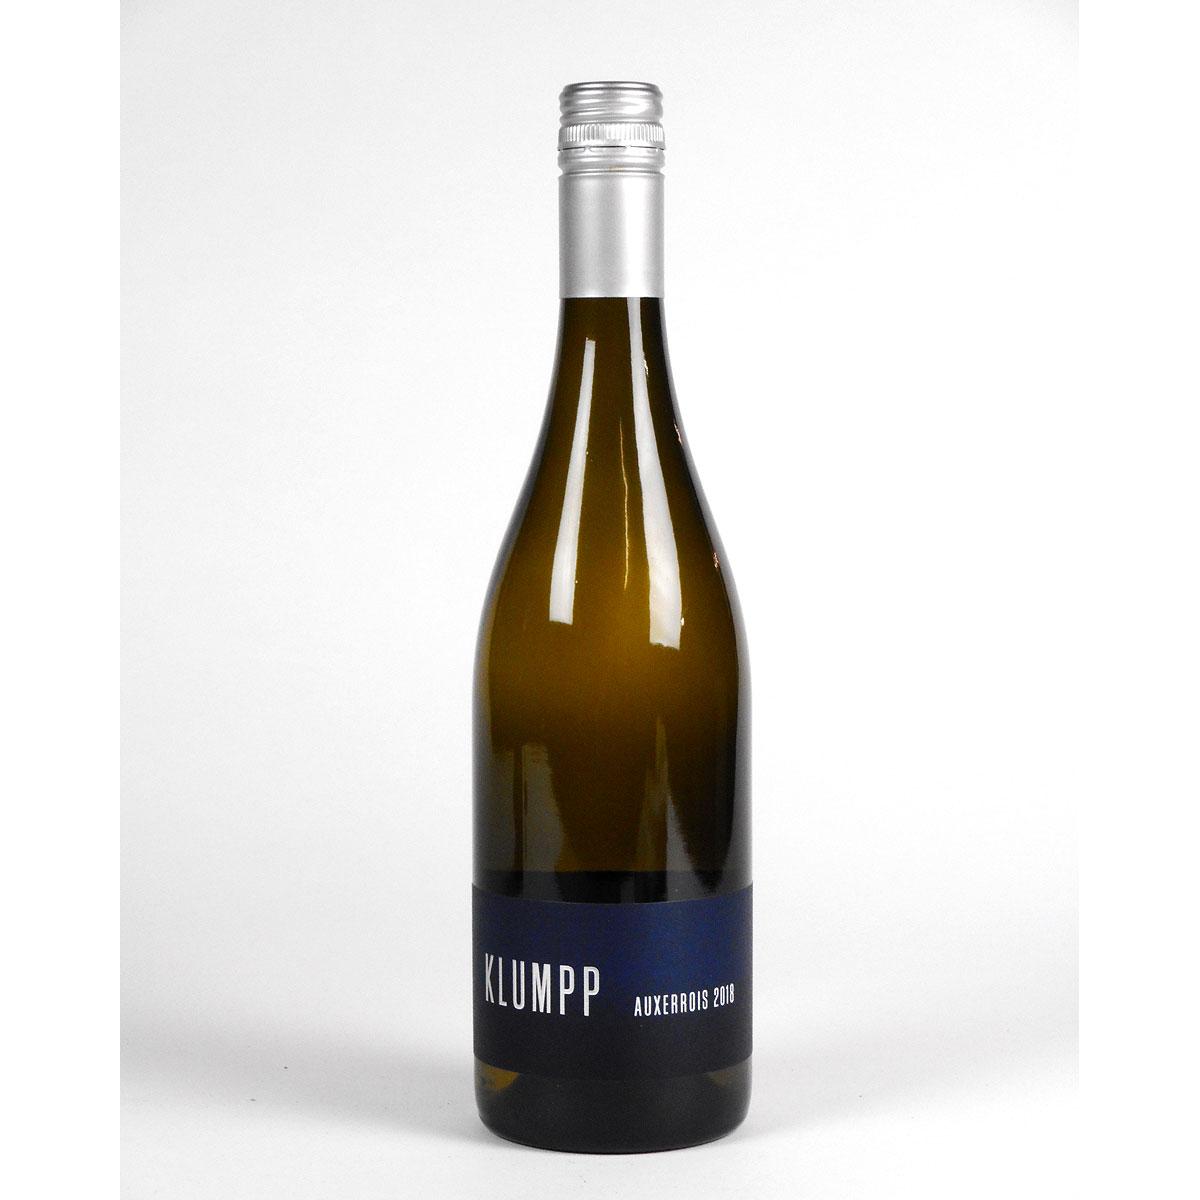 Baden: Klumpp Auxerrois 2018 - Bottle